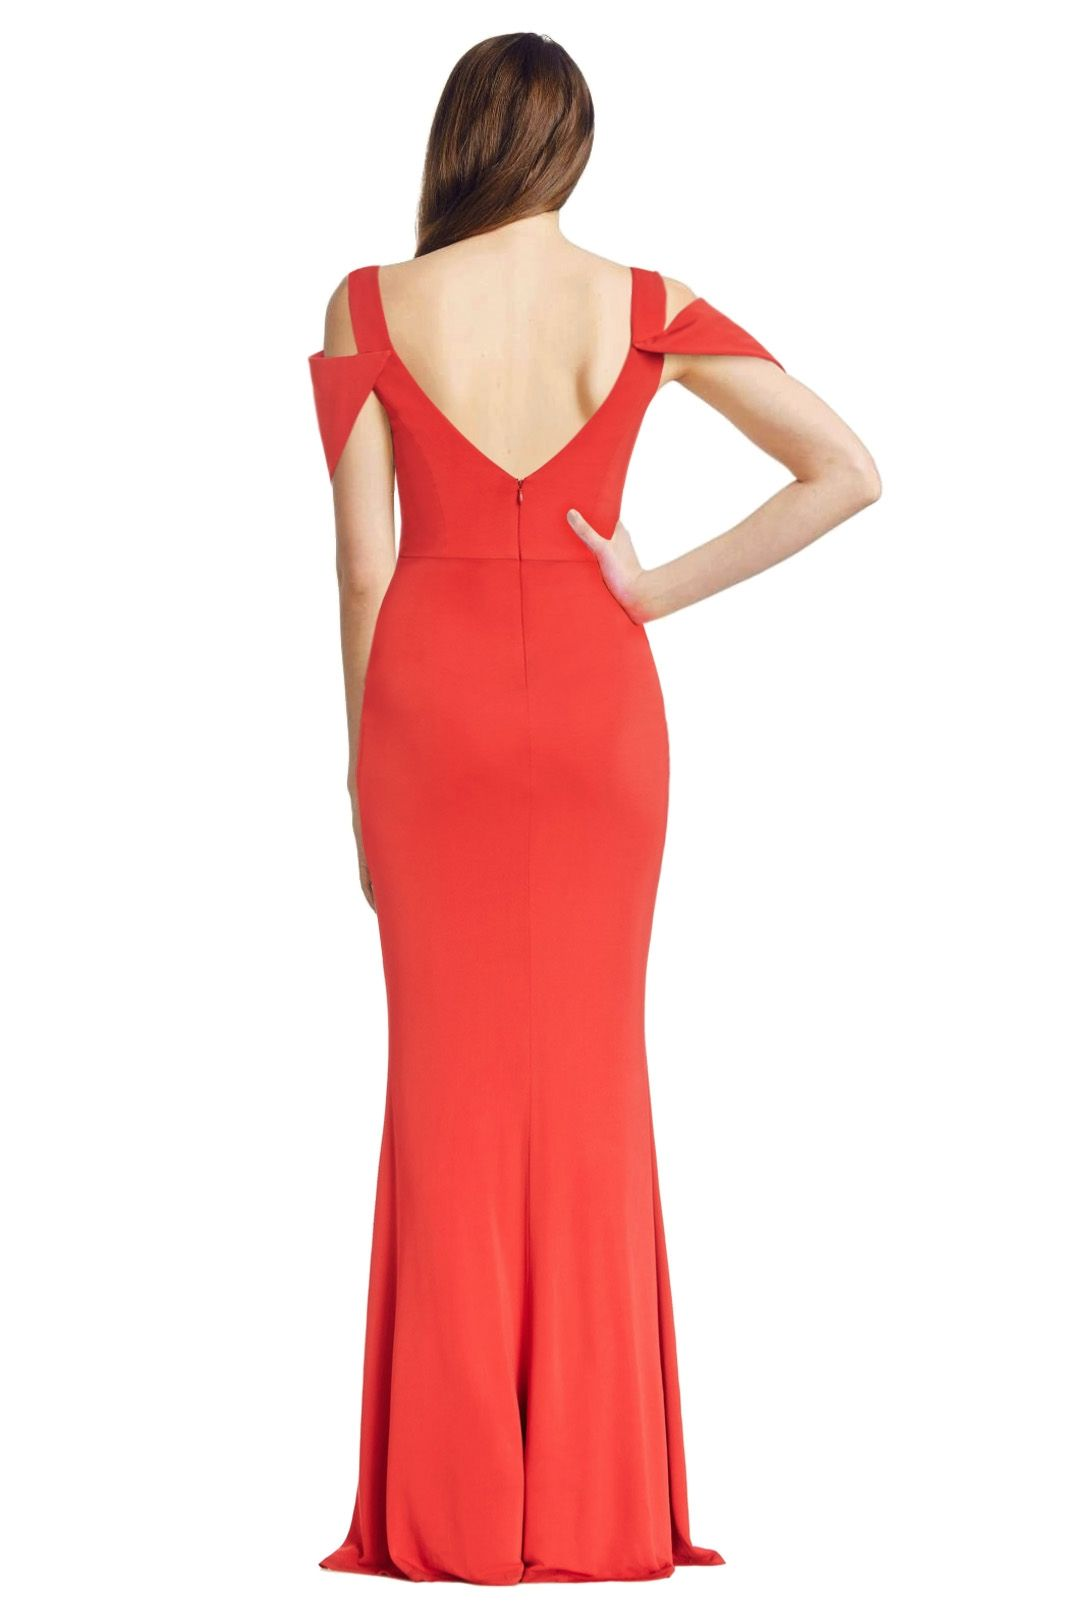 ABS by Allen Schwartz - Triangle Sleeve Deep V Neck Gown - Poppy Red - Back